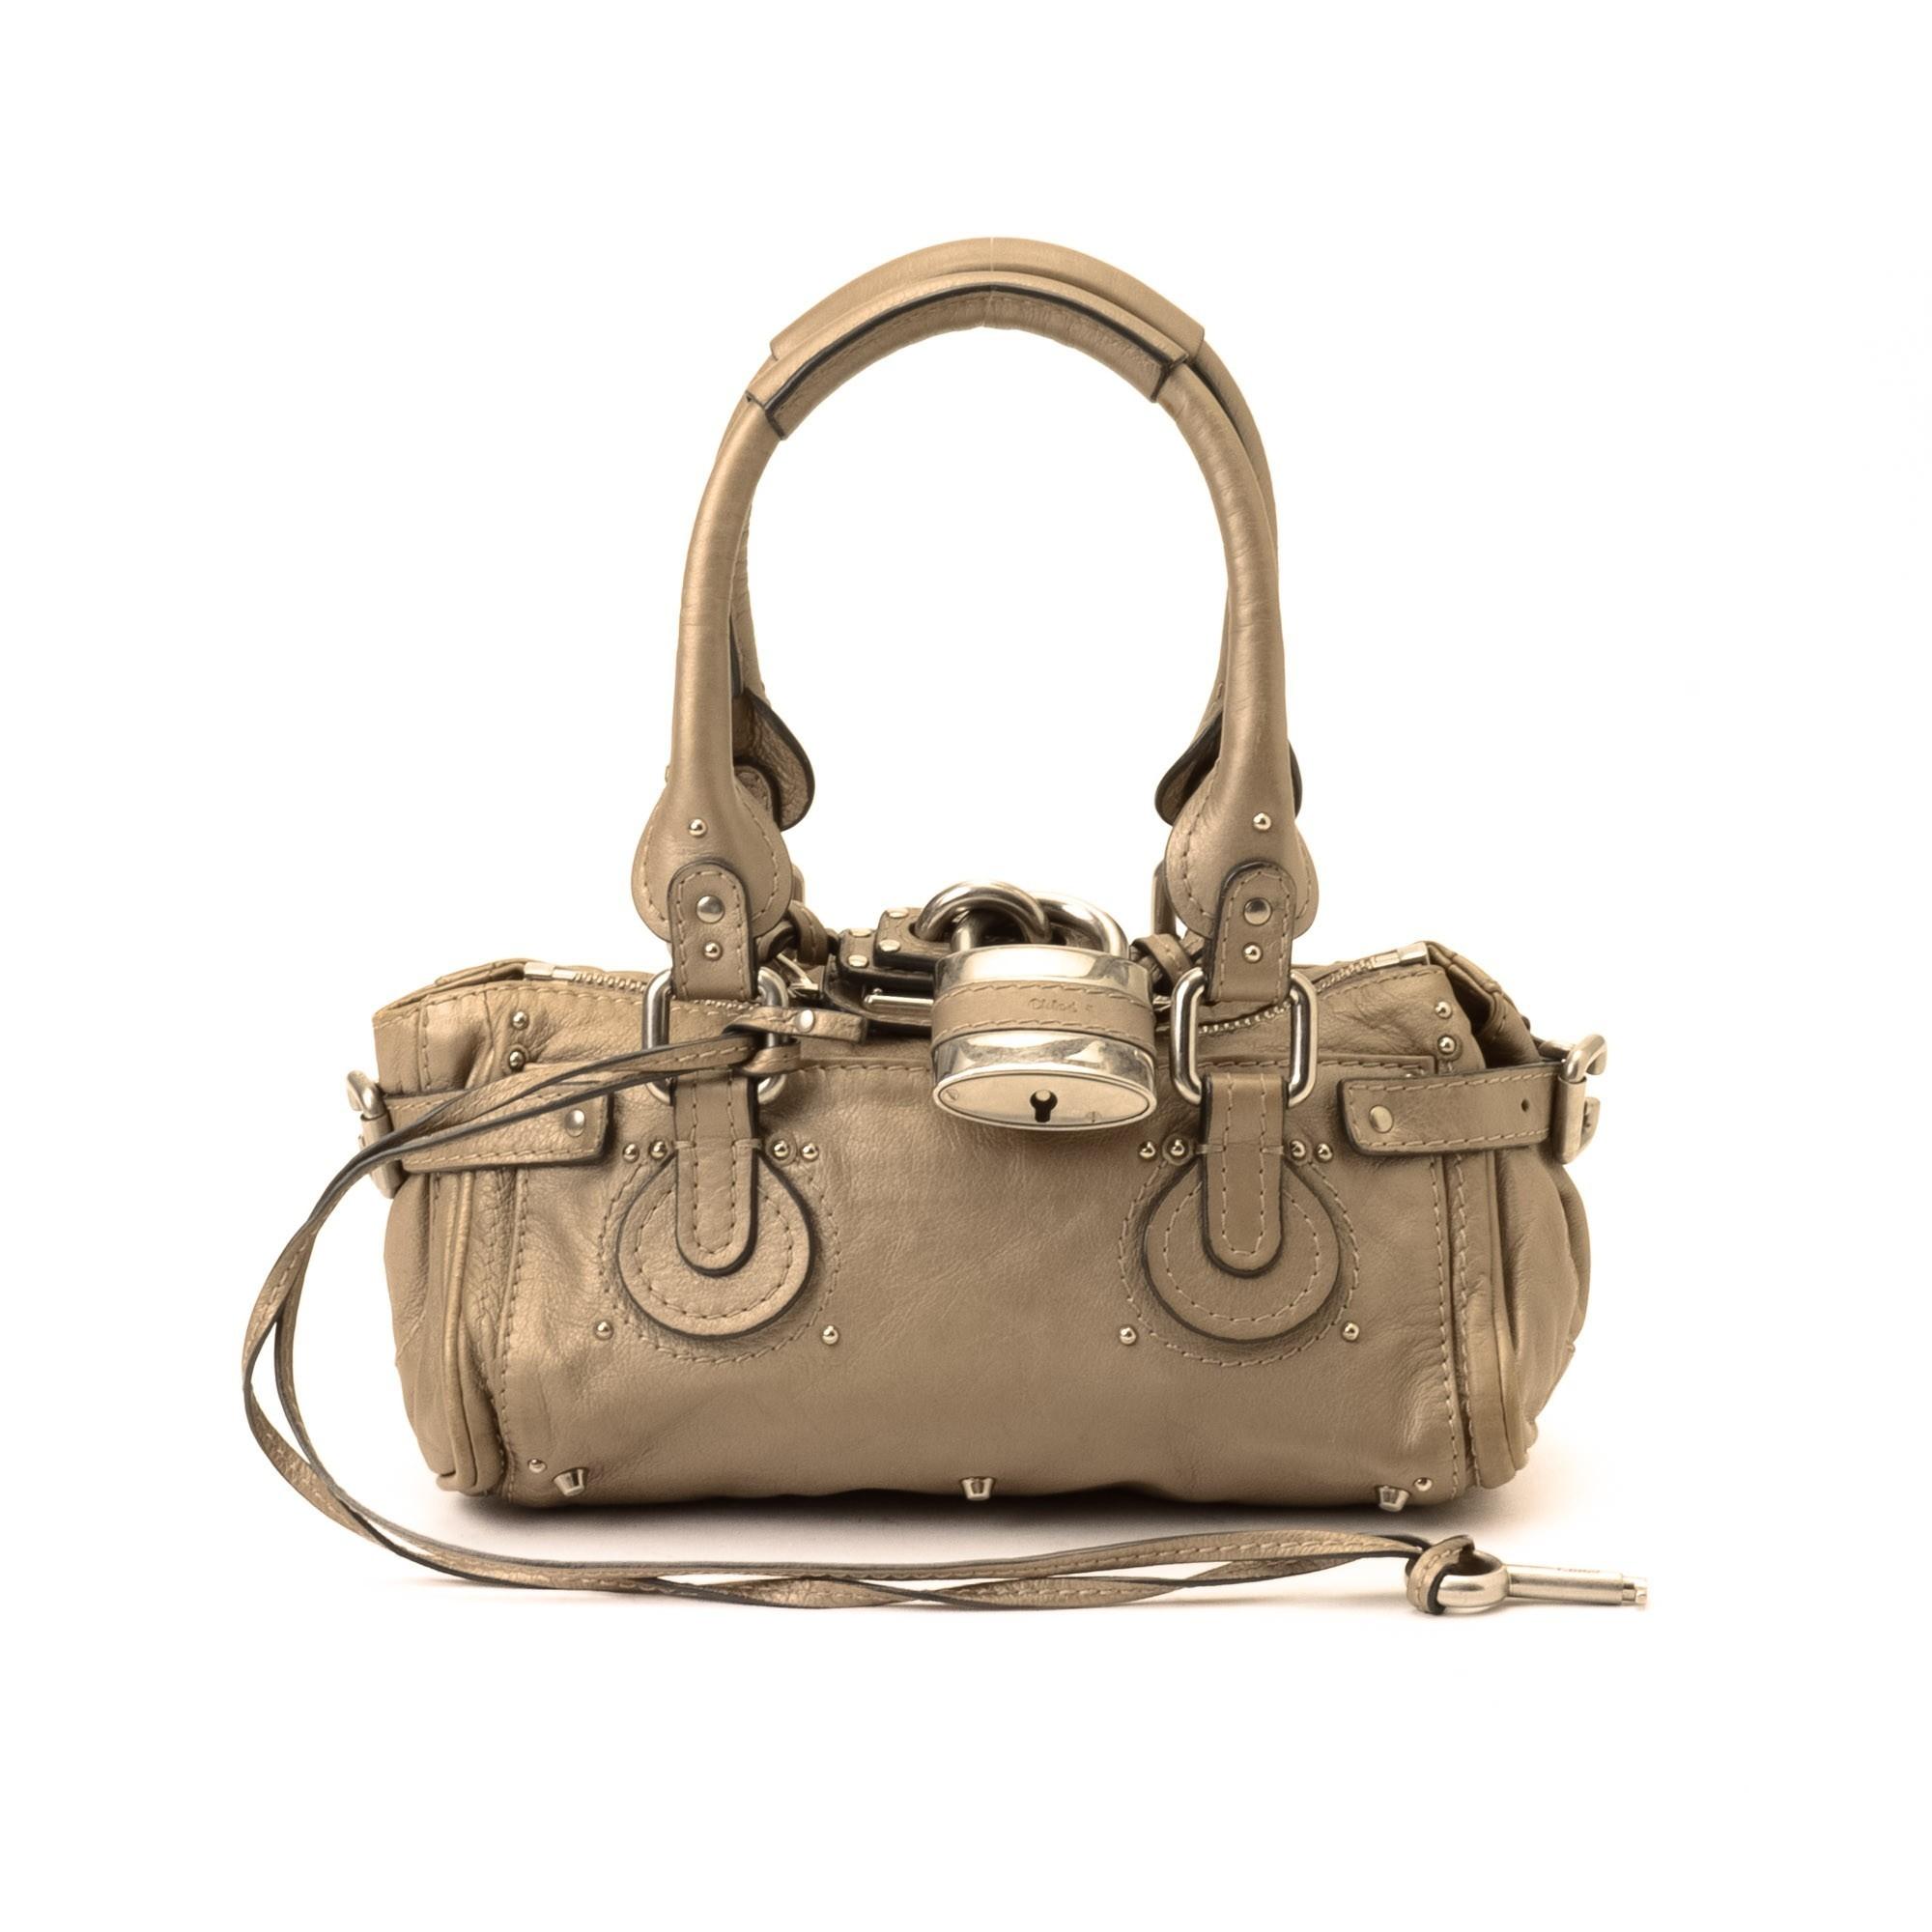 Chlo¨¦ Paddington Mini Handbag Beige Leather Handbag - LXR\u0026amp;CO ...